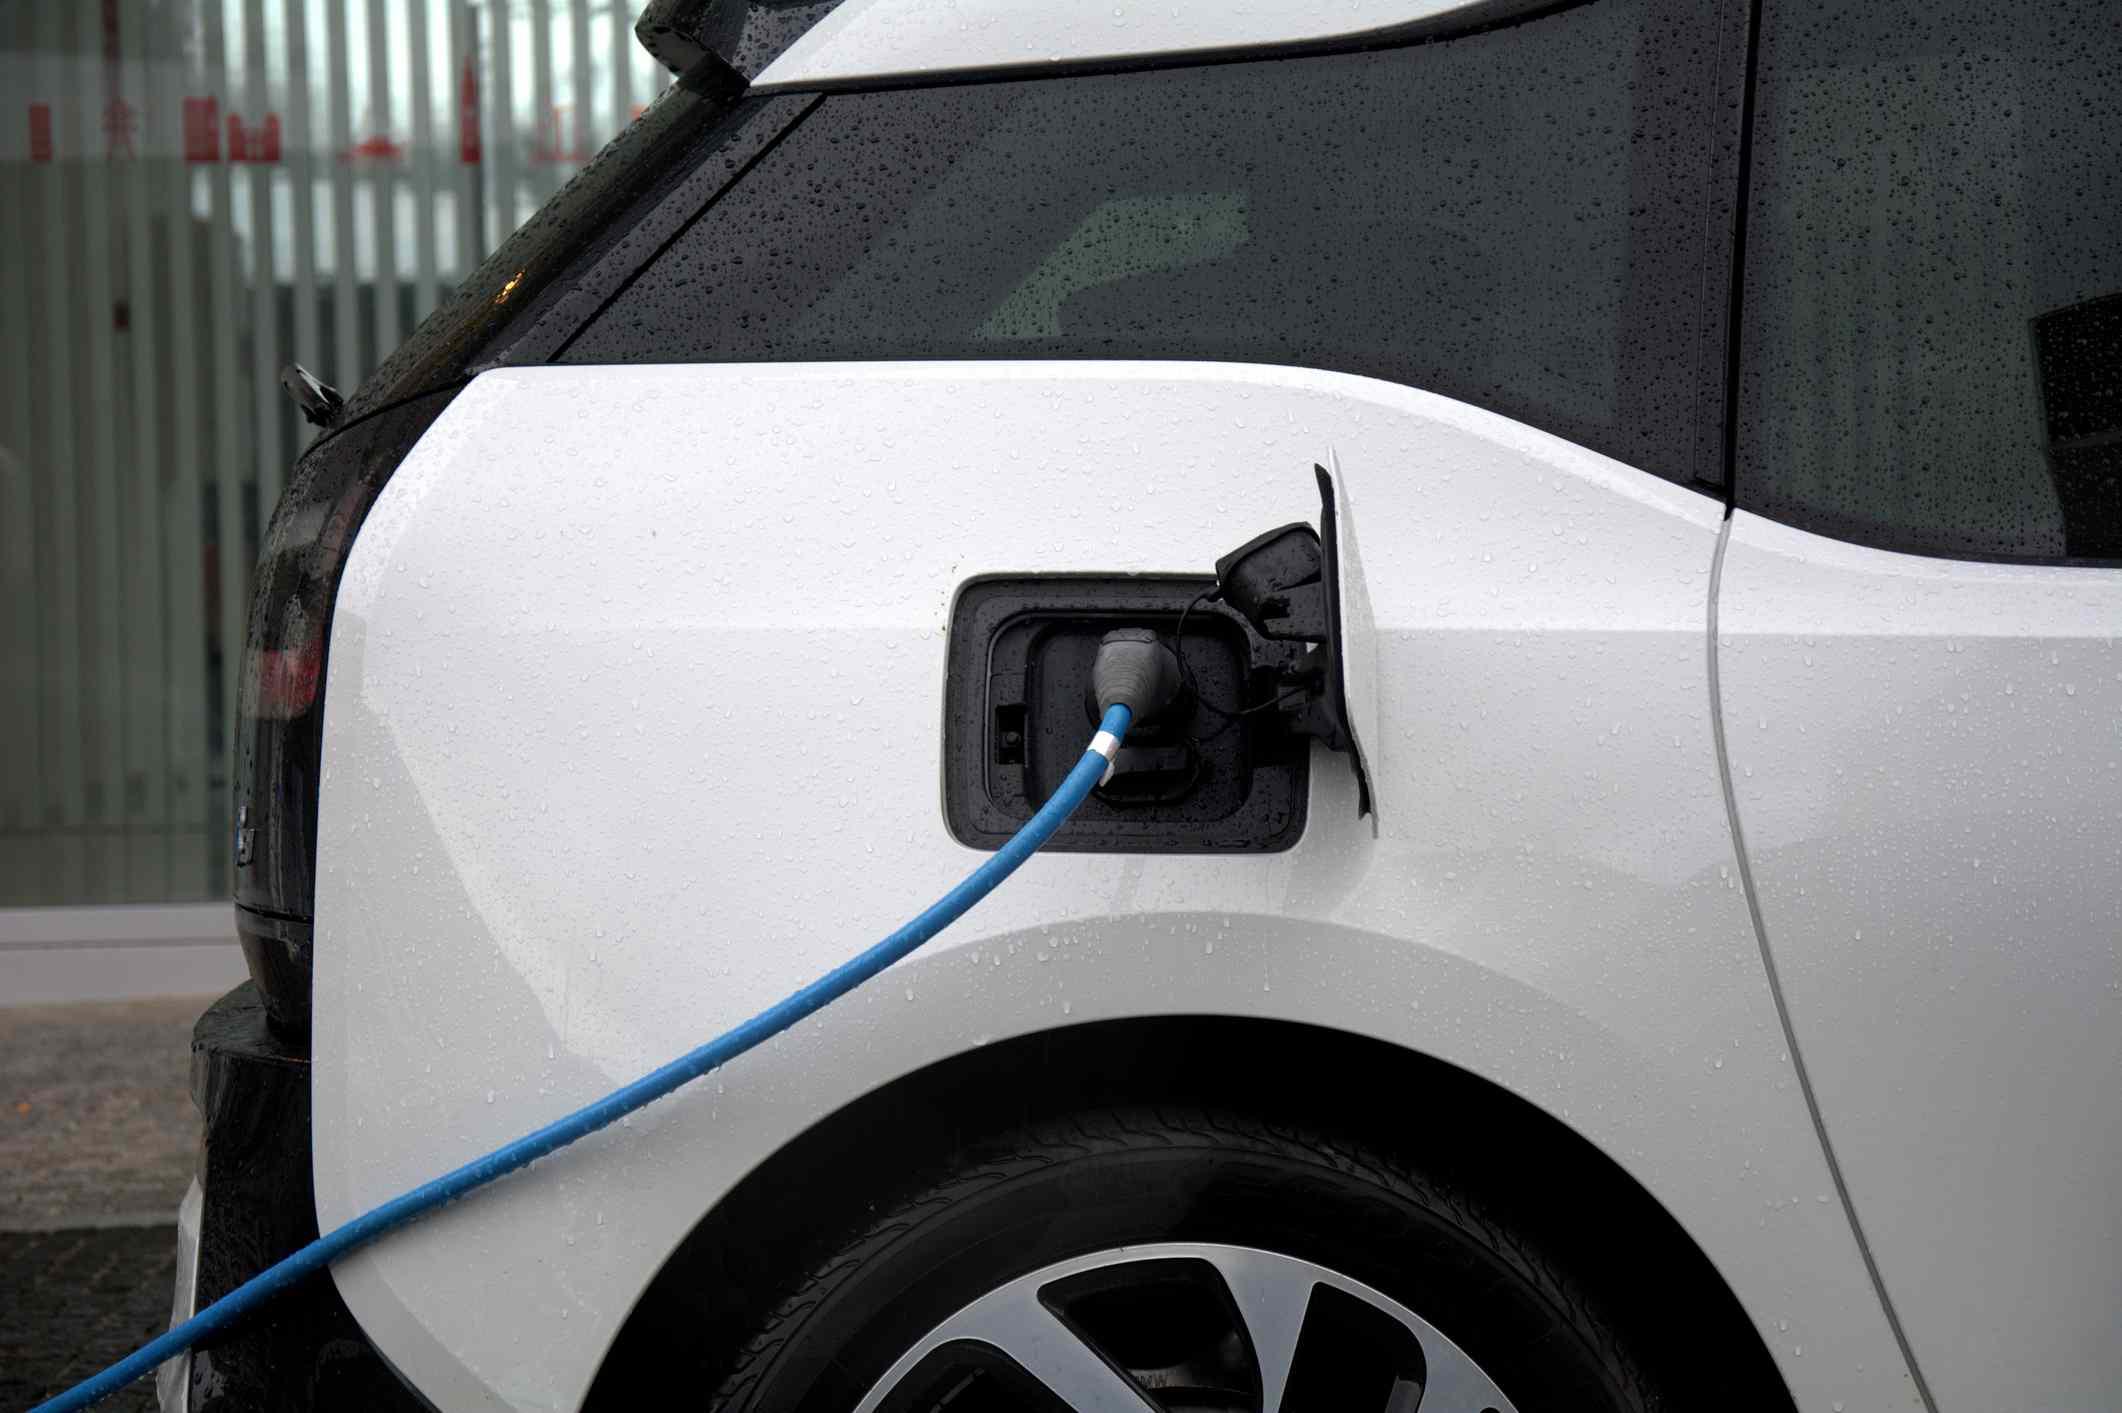 An electric vehicle recharging.